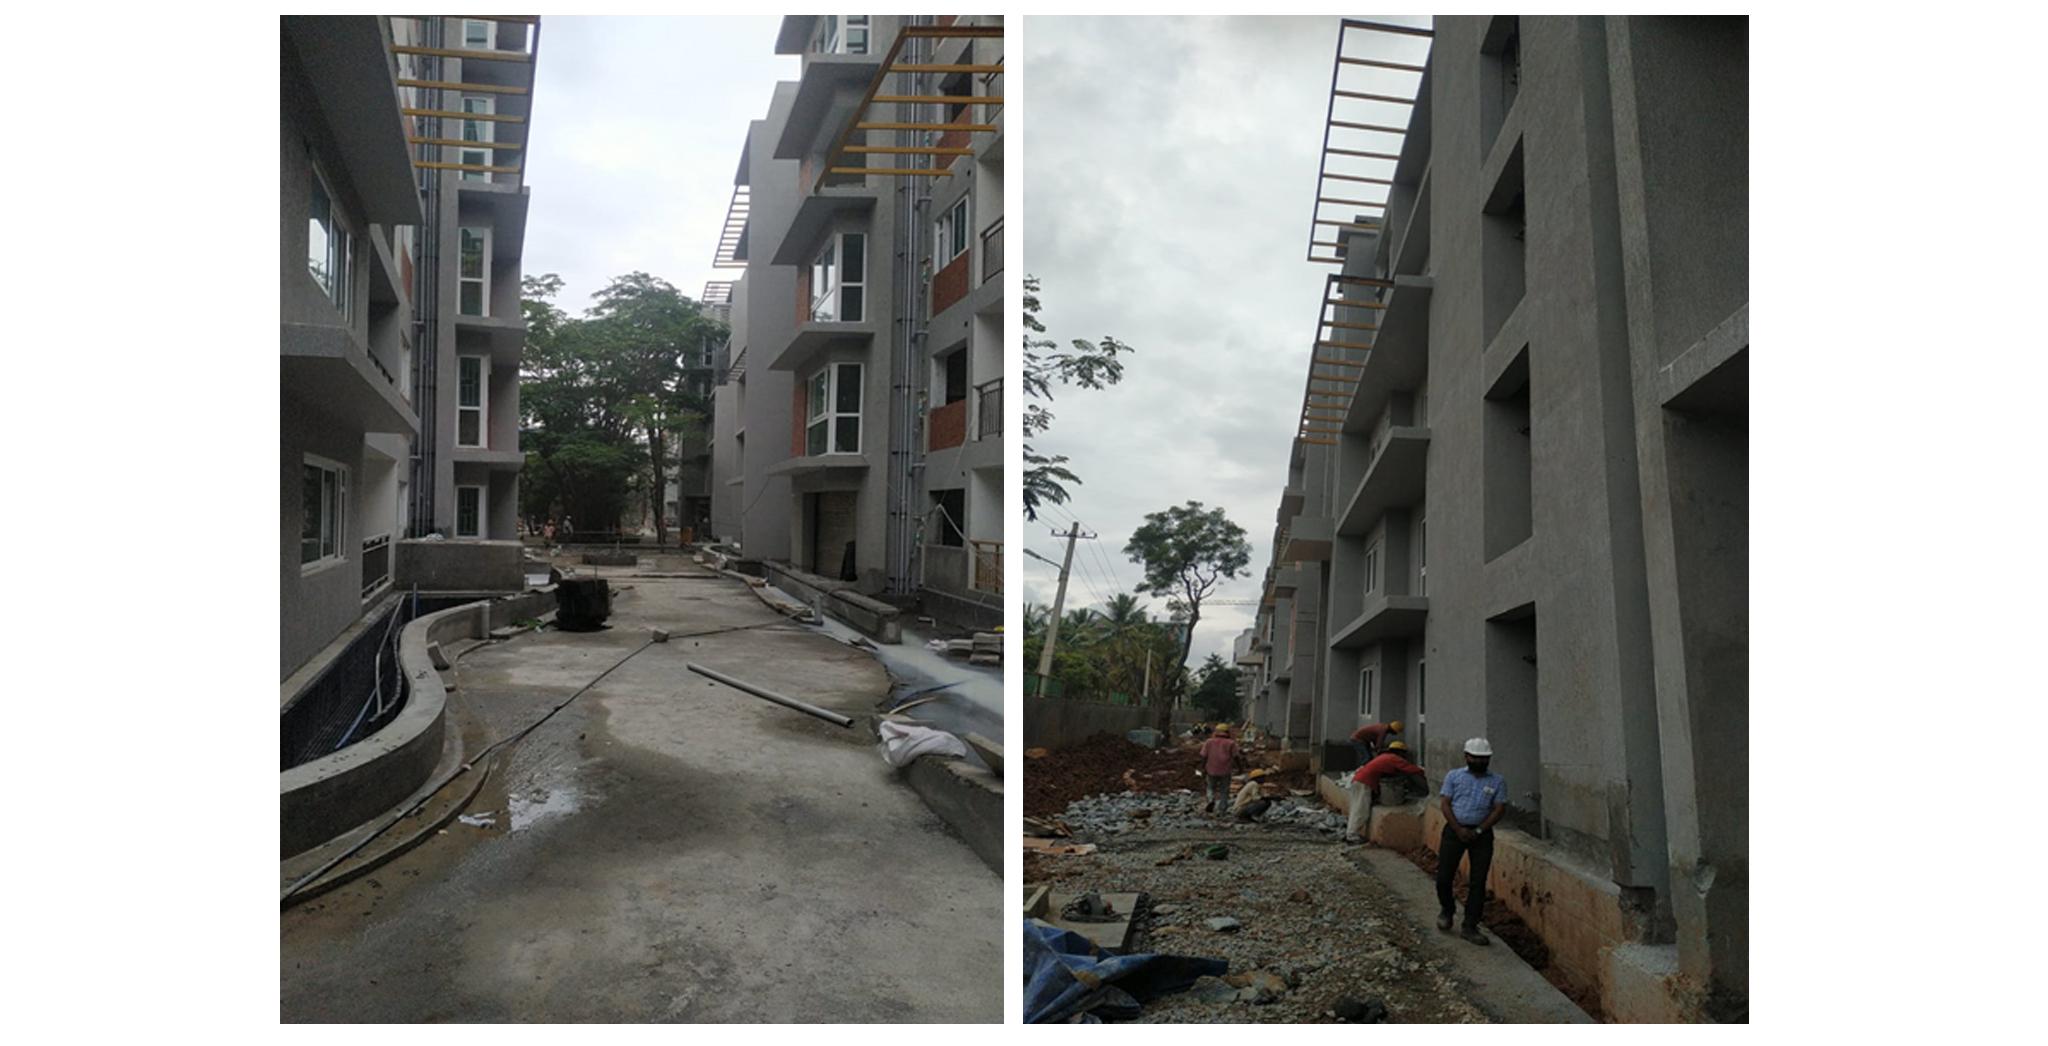 Aug 2021 - External development: Children play area work in progress